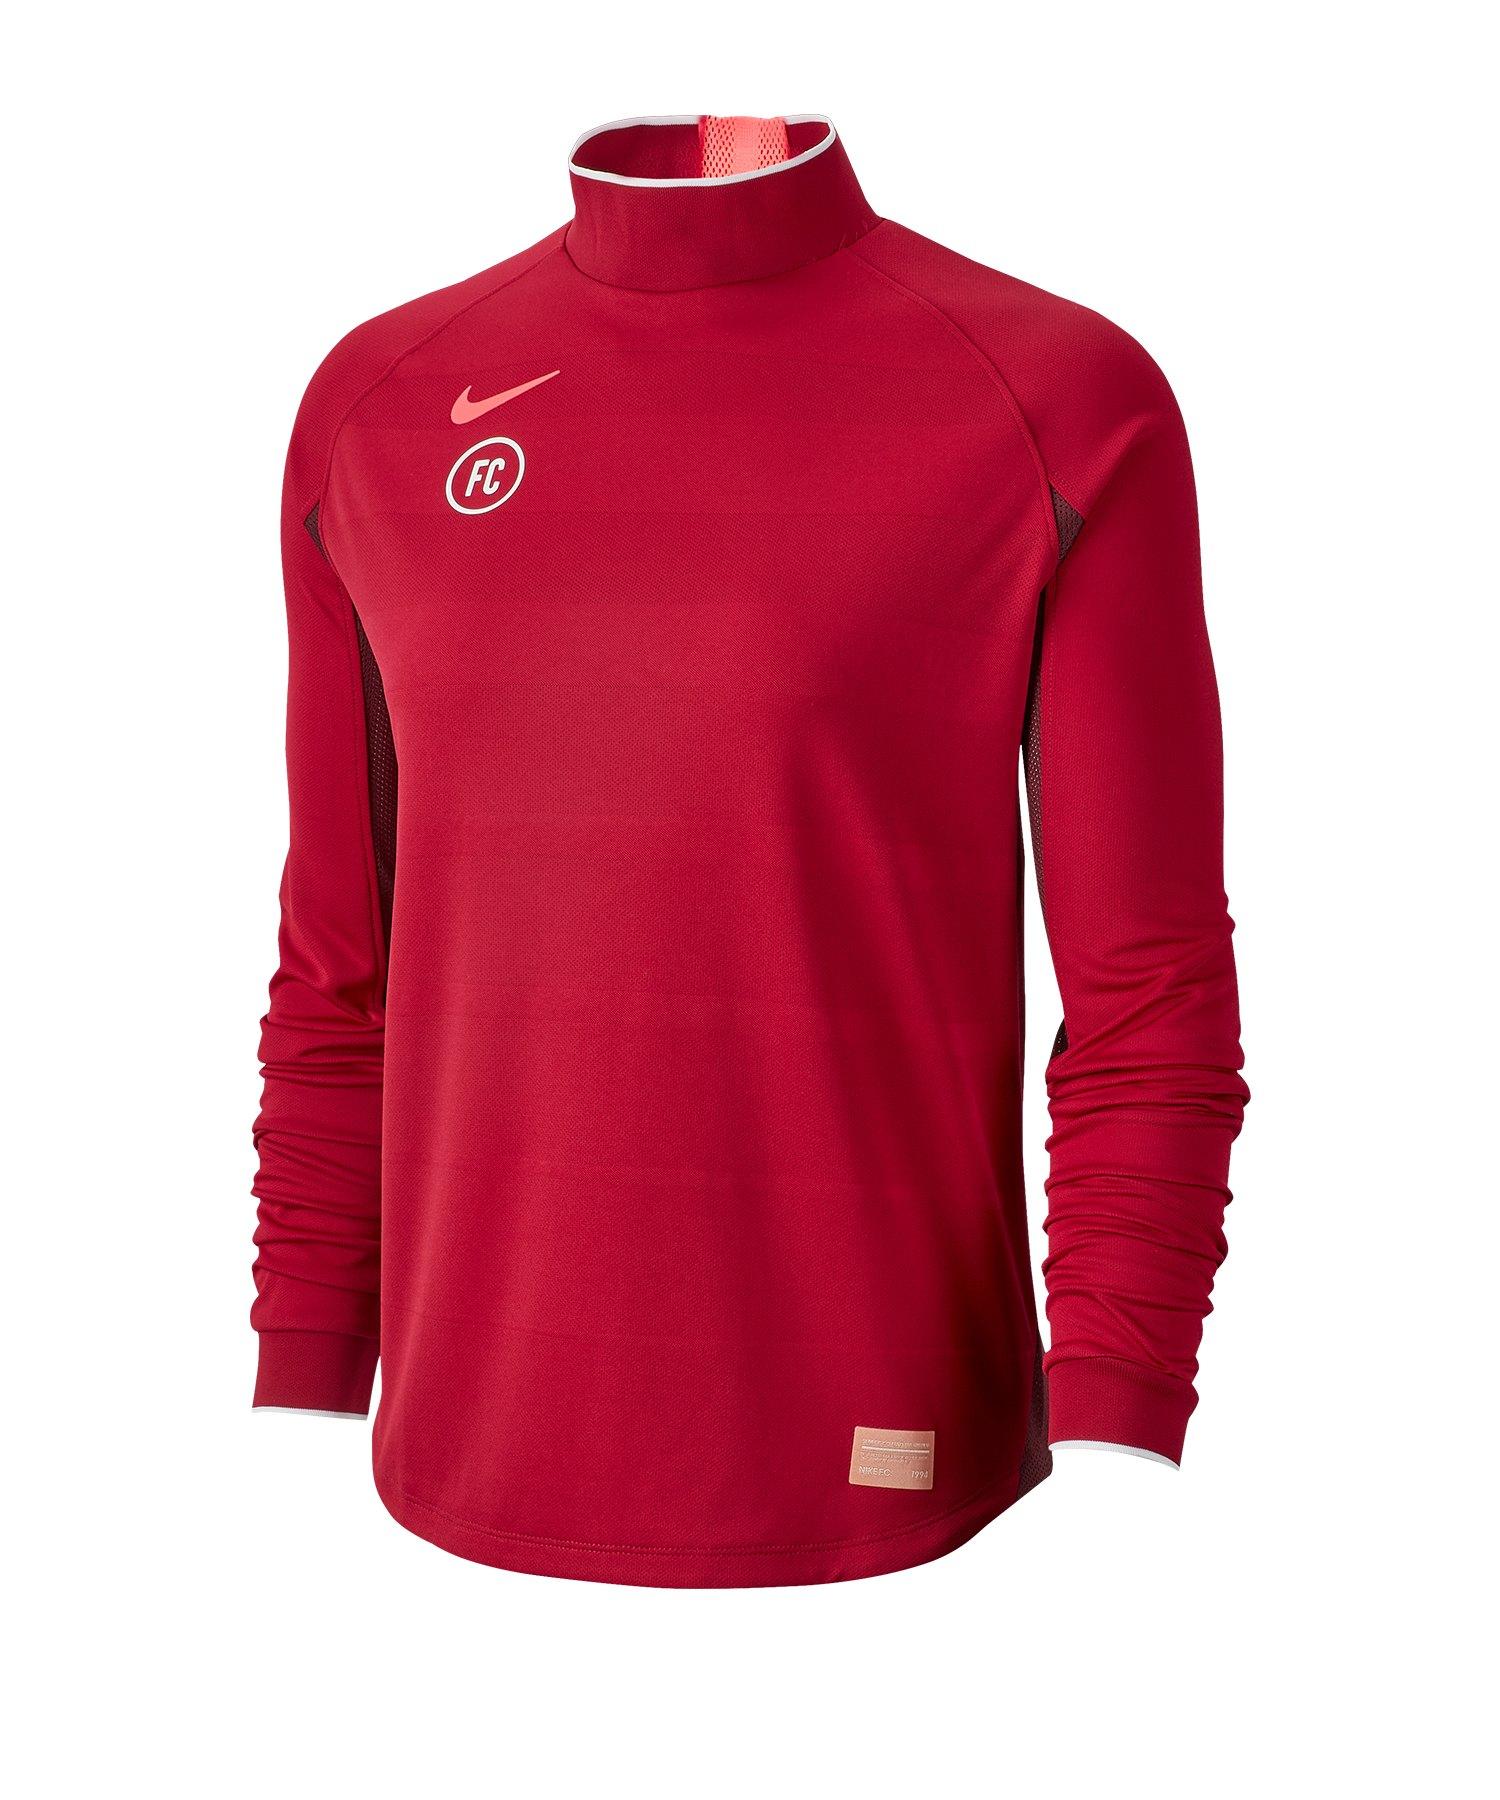 Nike F.C. Dri-FIT Trainingsweatshirt Damen F620 - rot